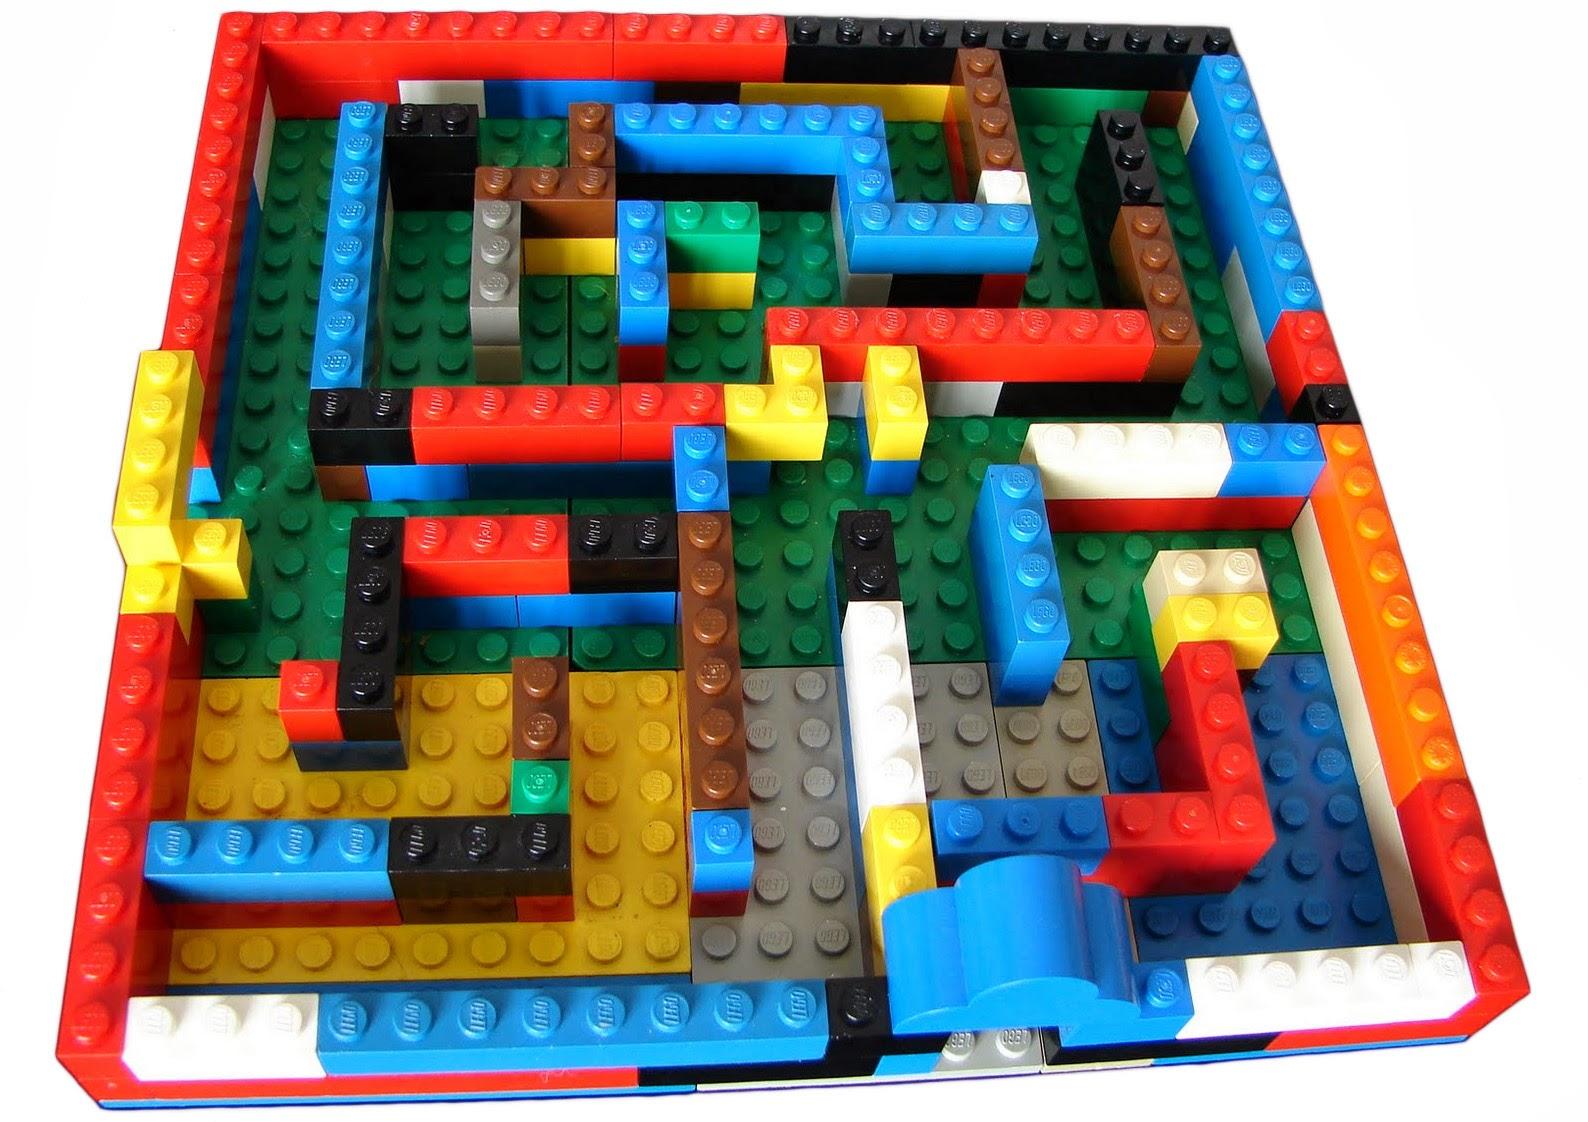 la petite fabrique de jeu vid o le level design. Black Bedroom Furniture Sets. Home Design Ideas